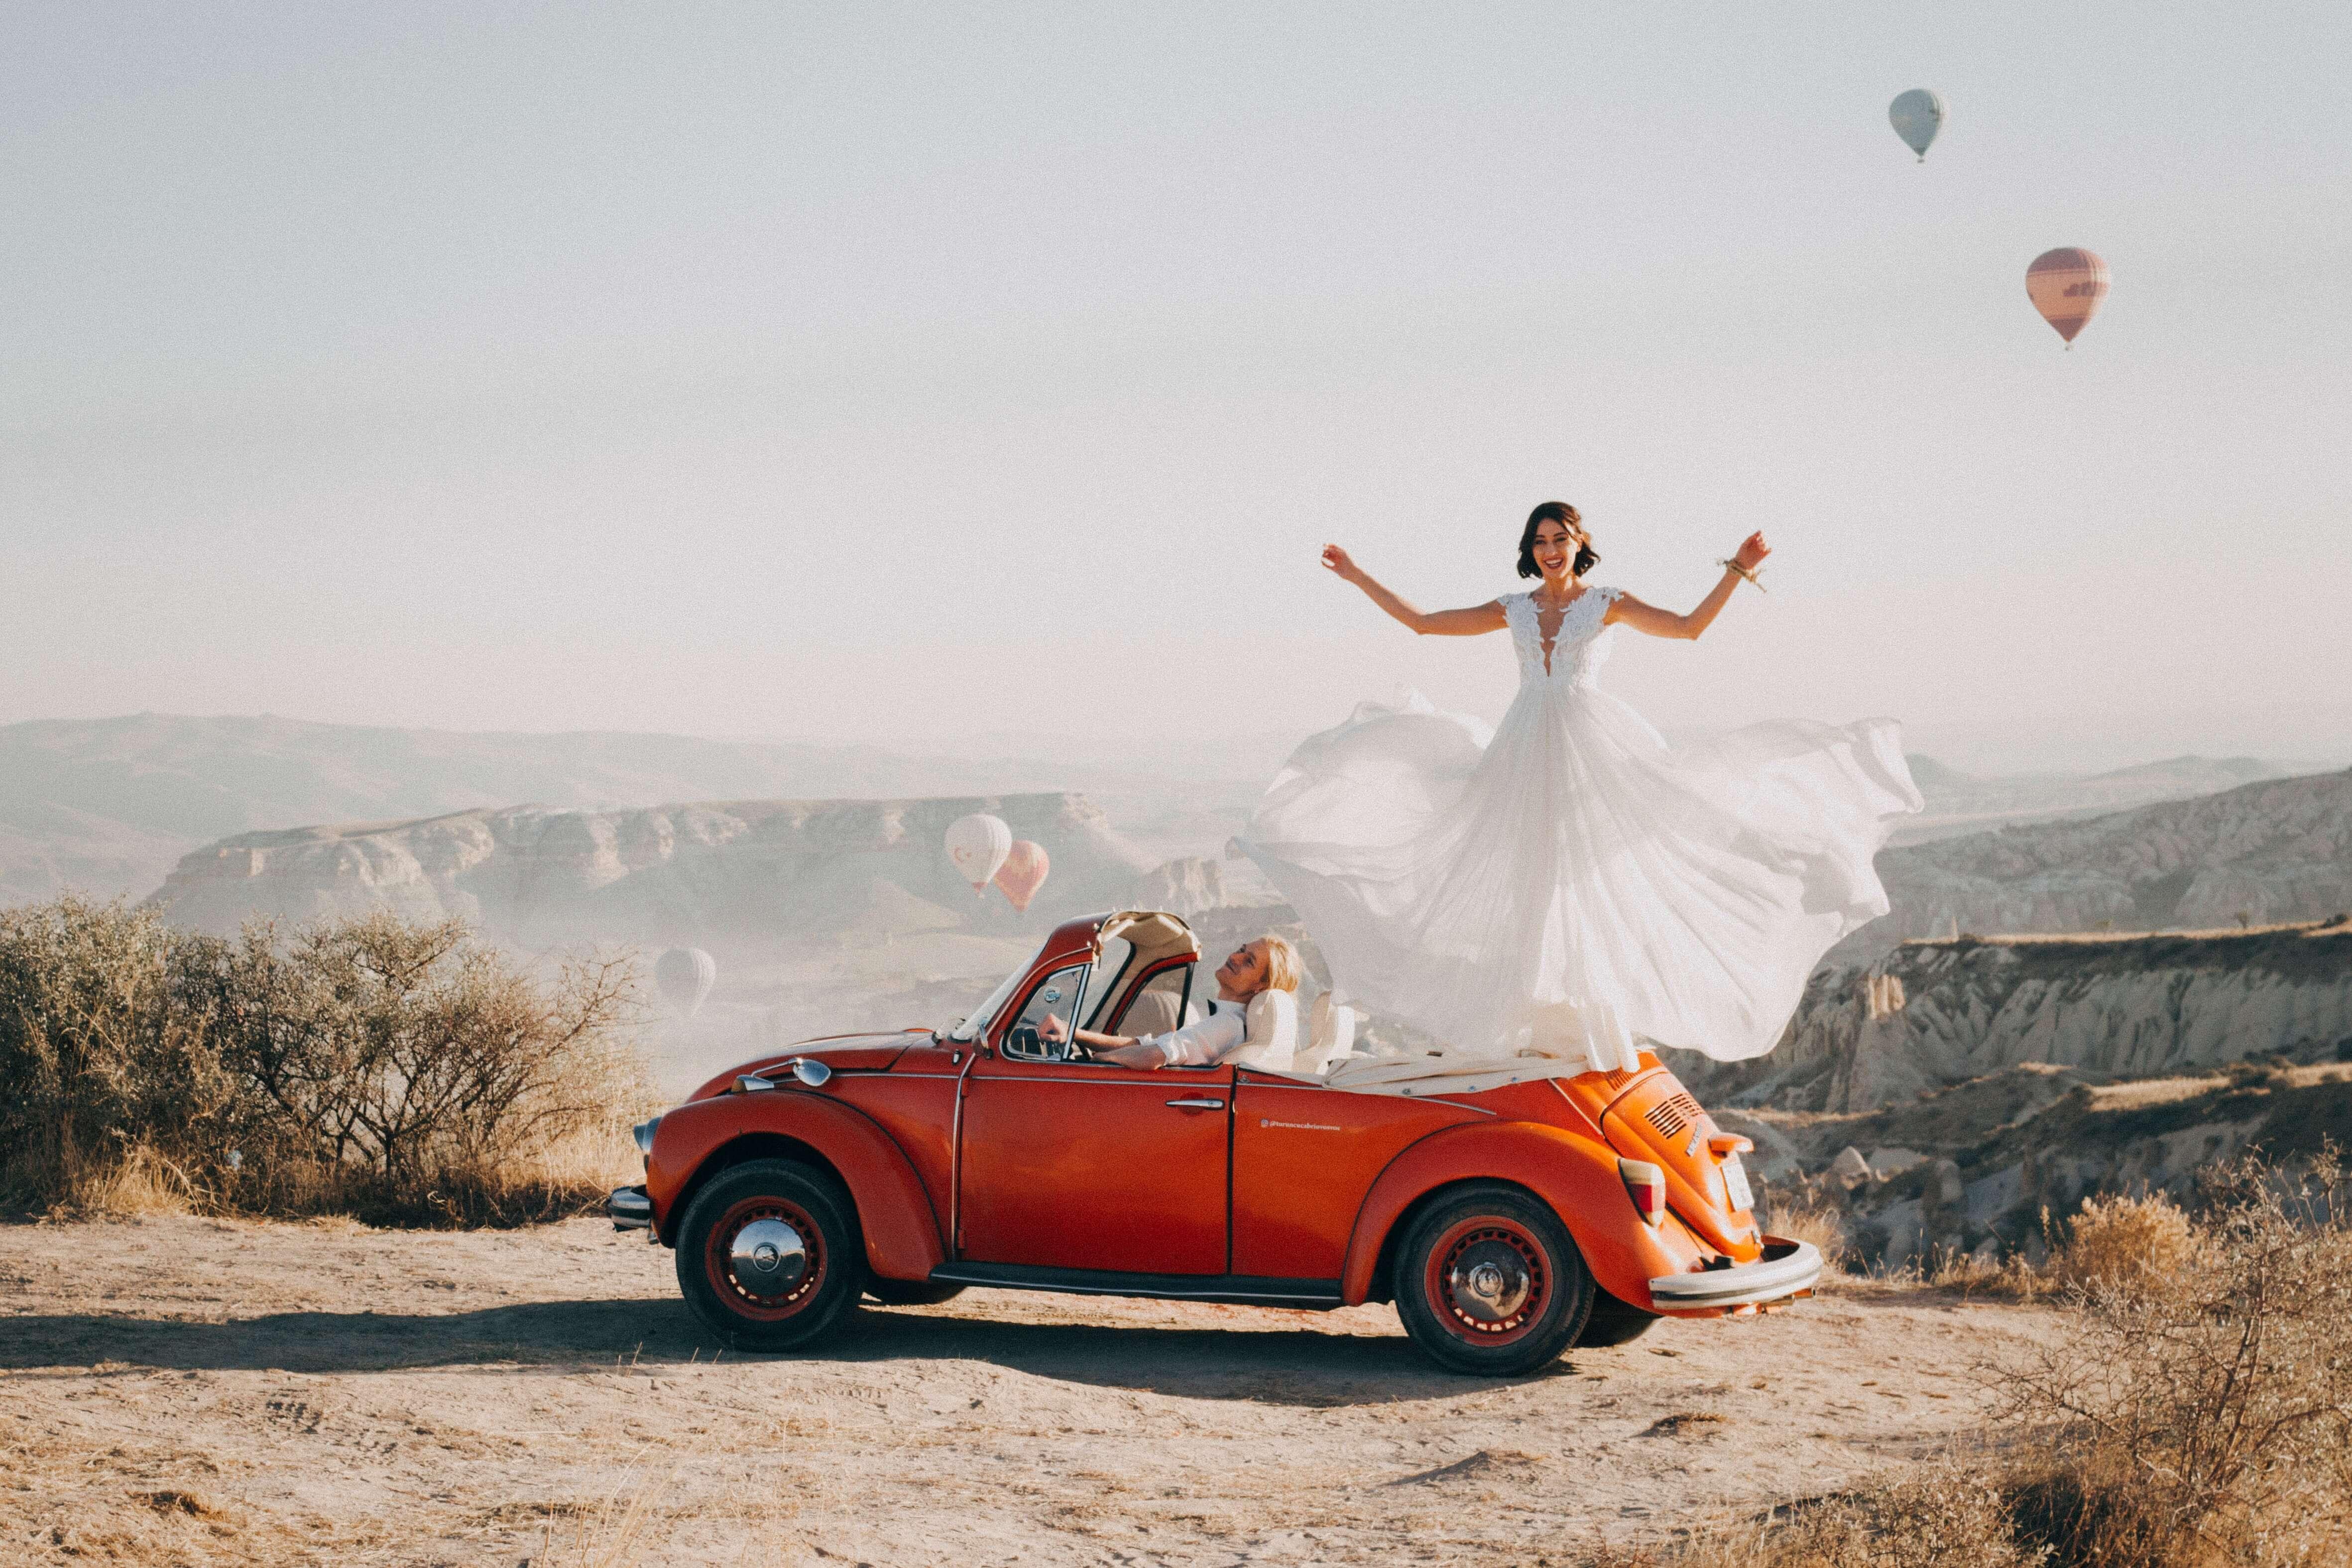 Woman wearing wedding dress standing on VW Beetle near canyon